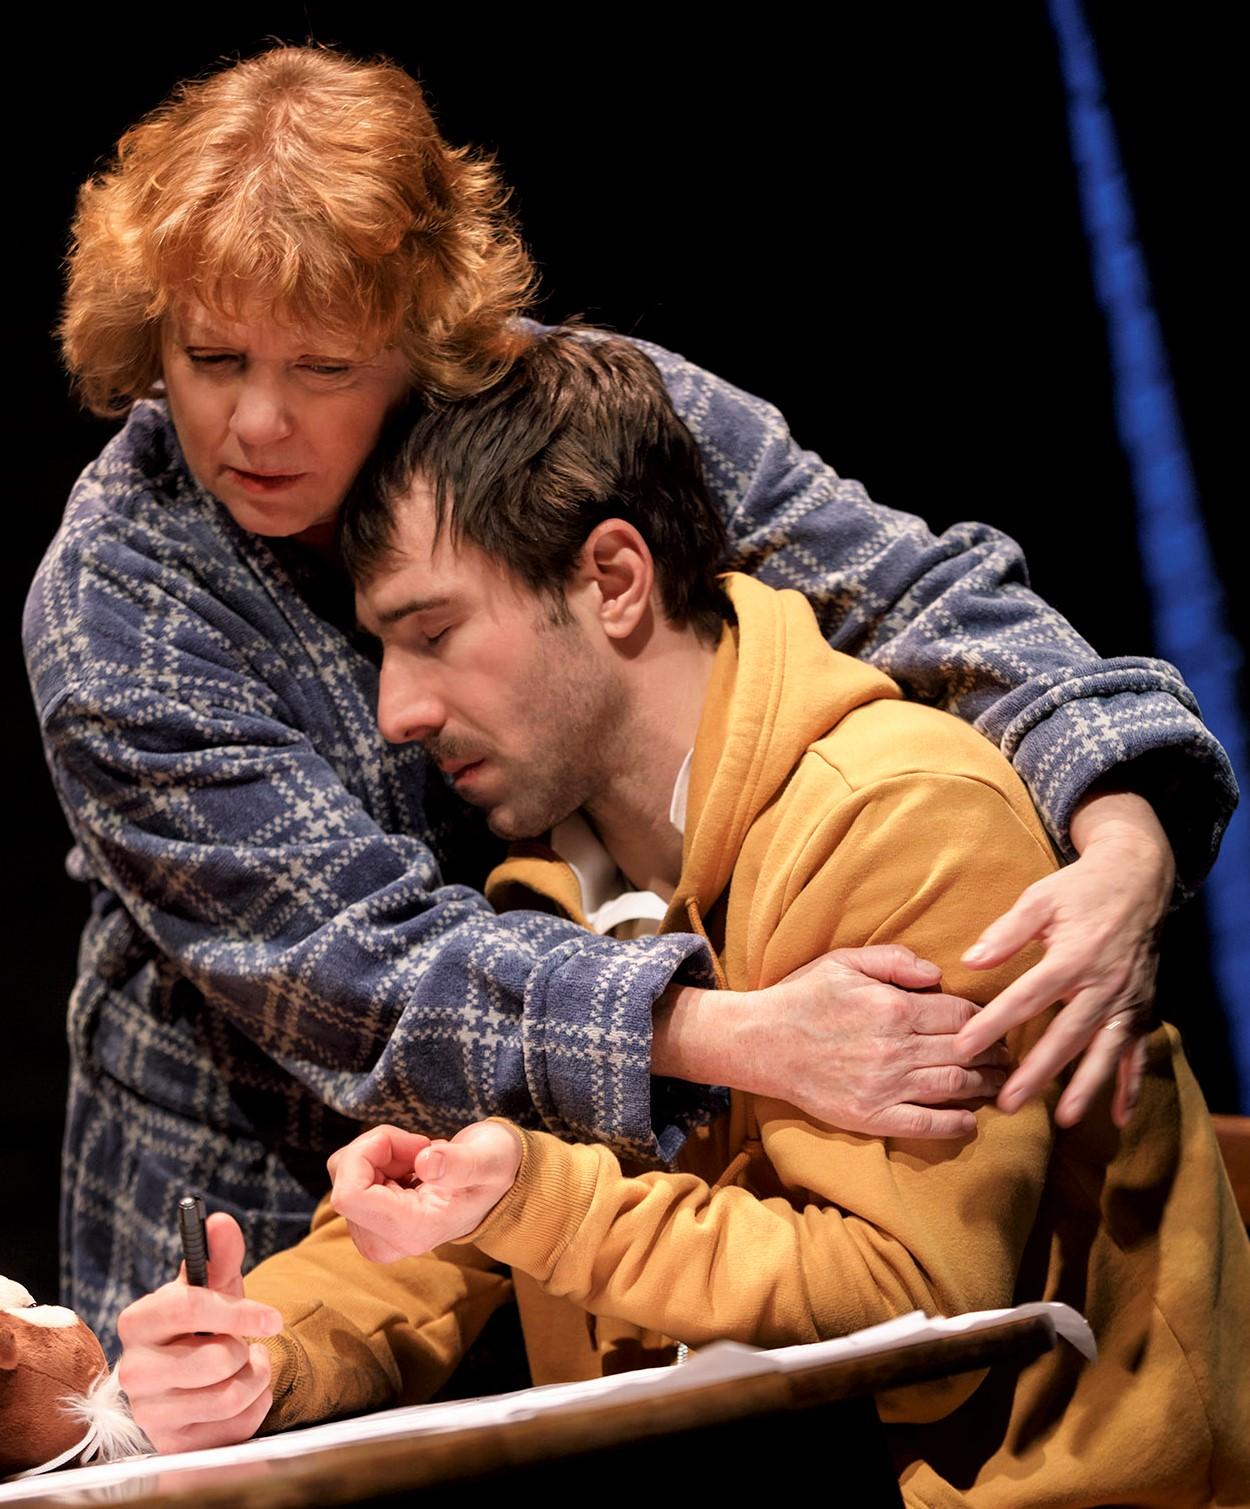 Nancy (Becky Ann Baker) comforts her son, Nat (Alex Hurt). Photographs by Joan Marcus.